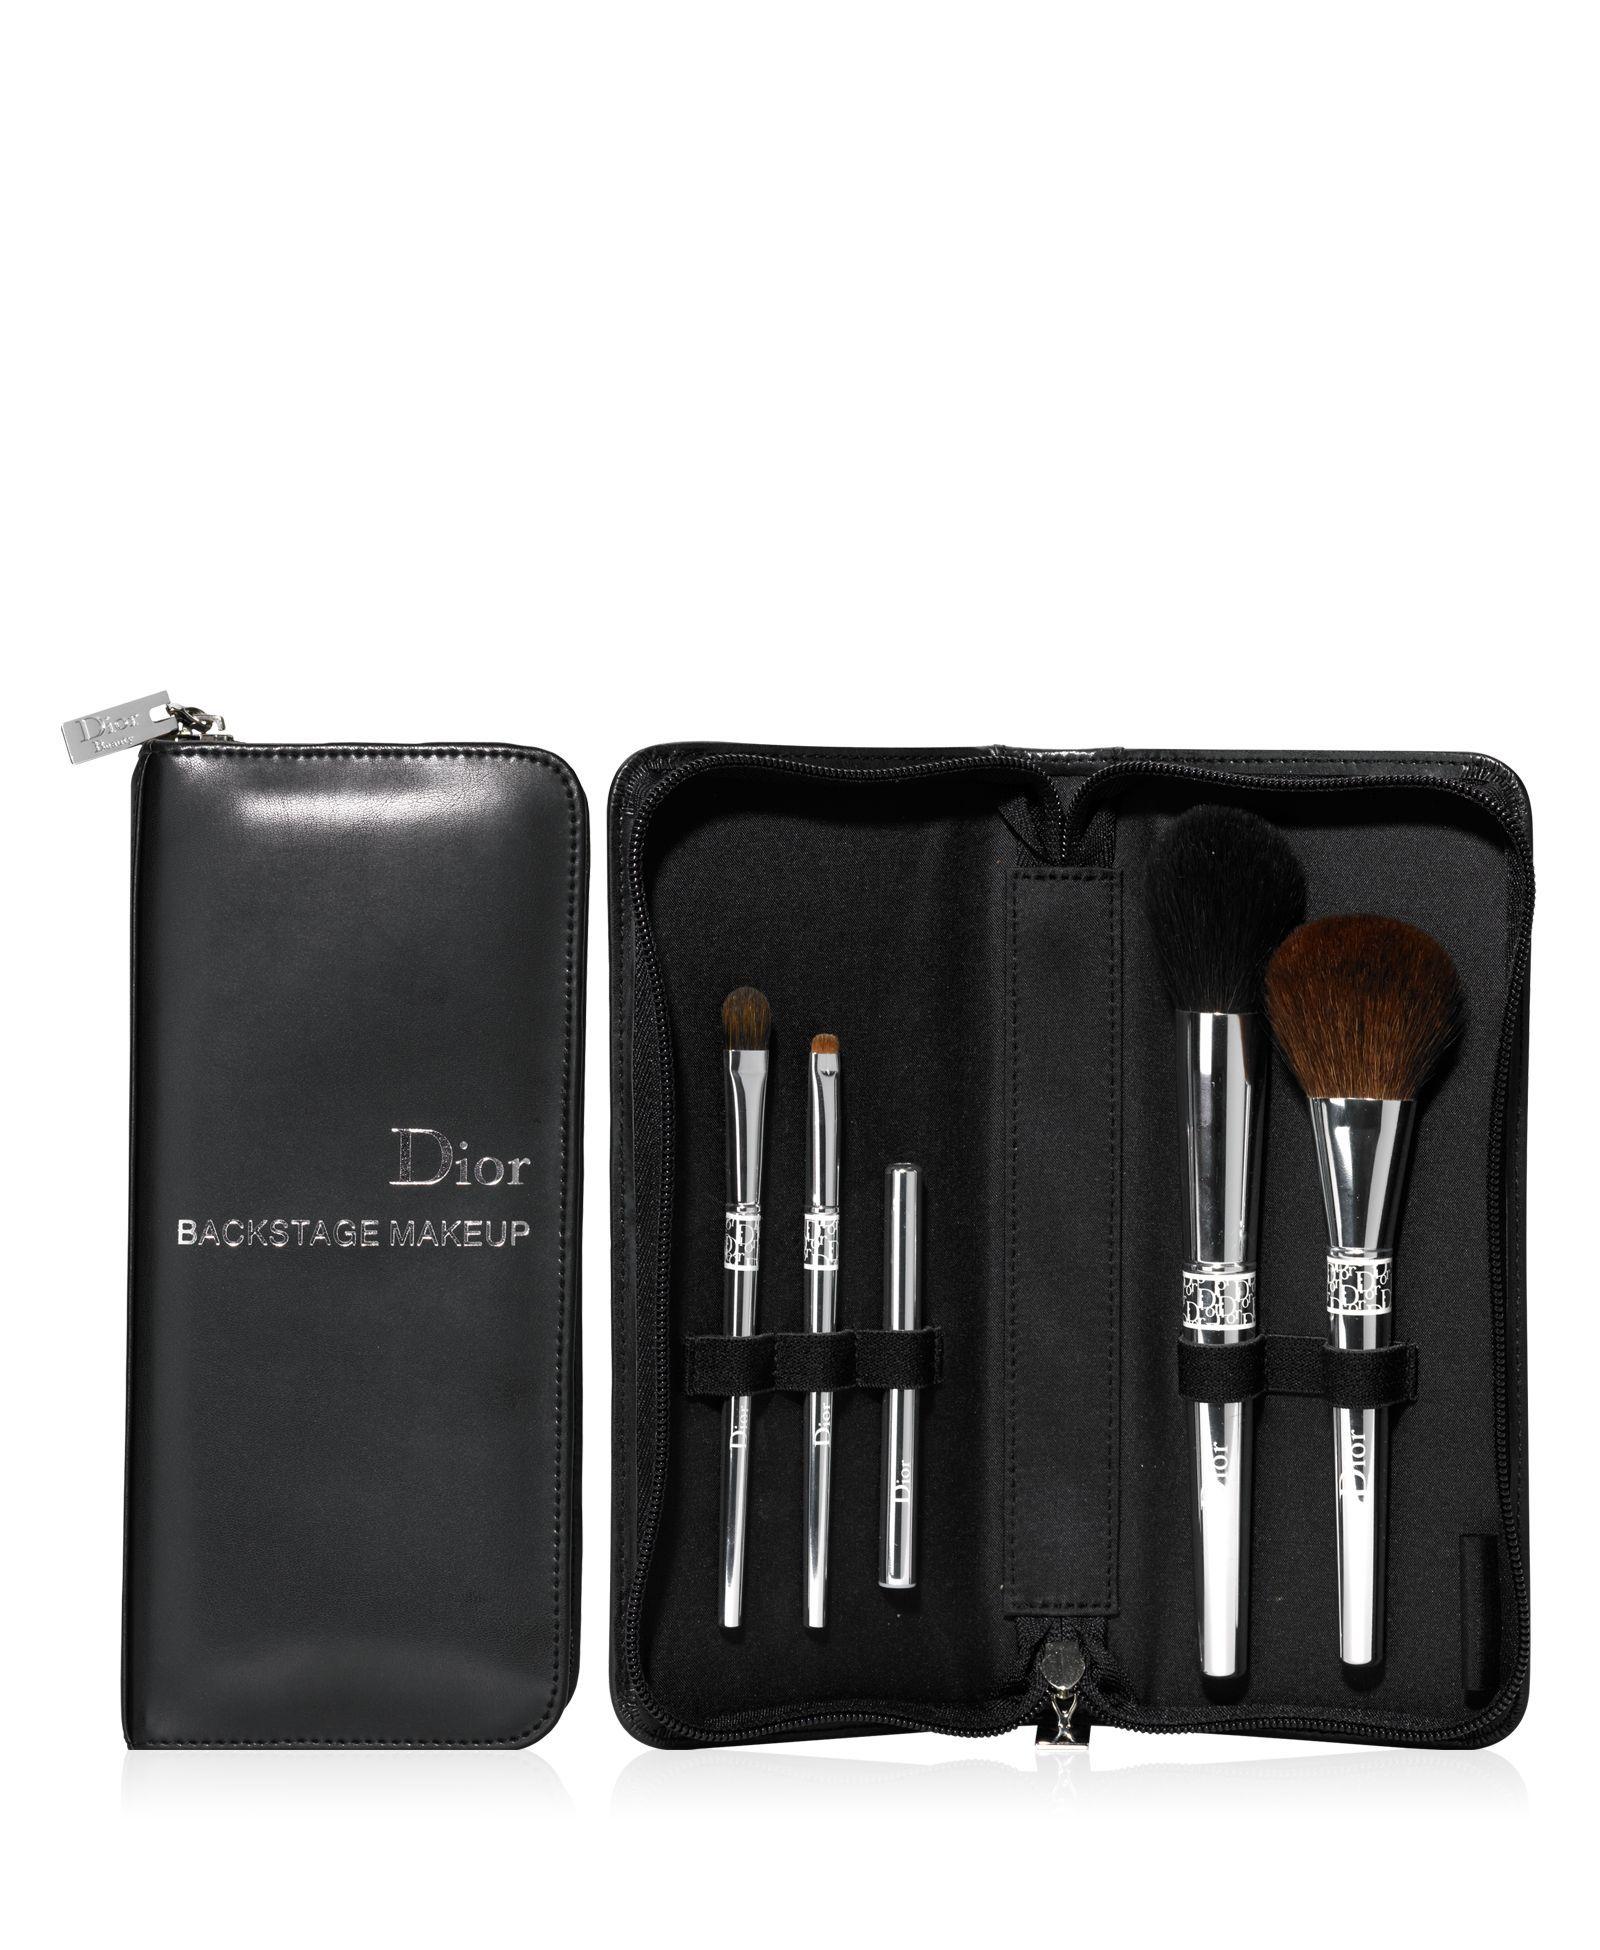 Dior makeup kit Makyaj ürünleri, Makyaj, Aksesuarlar